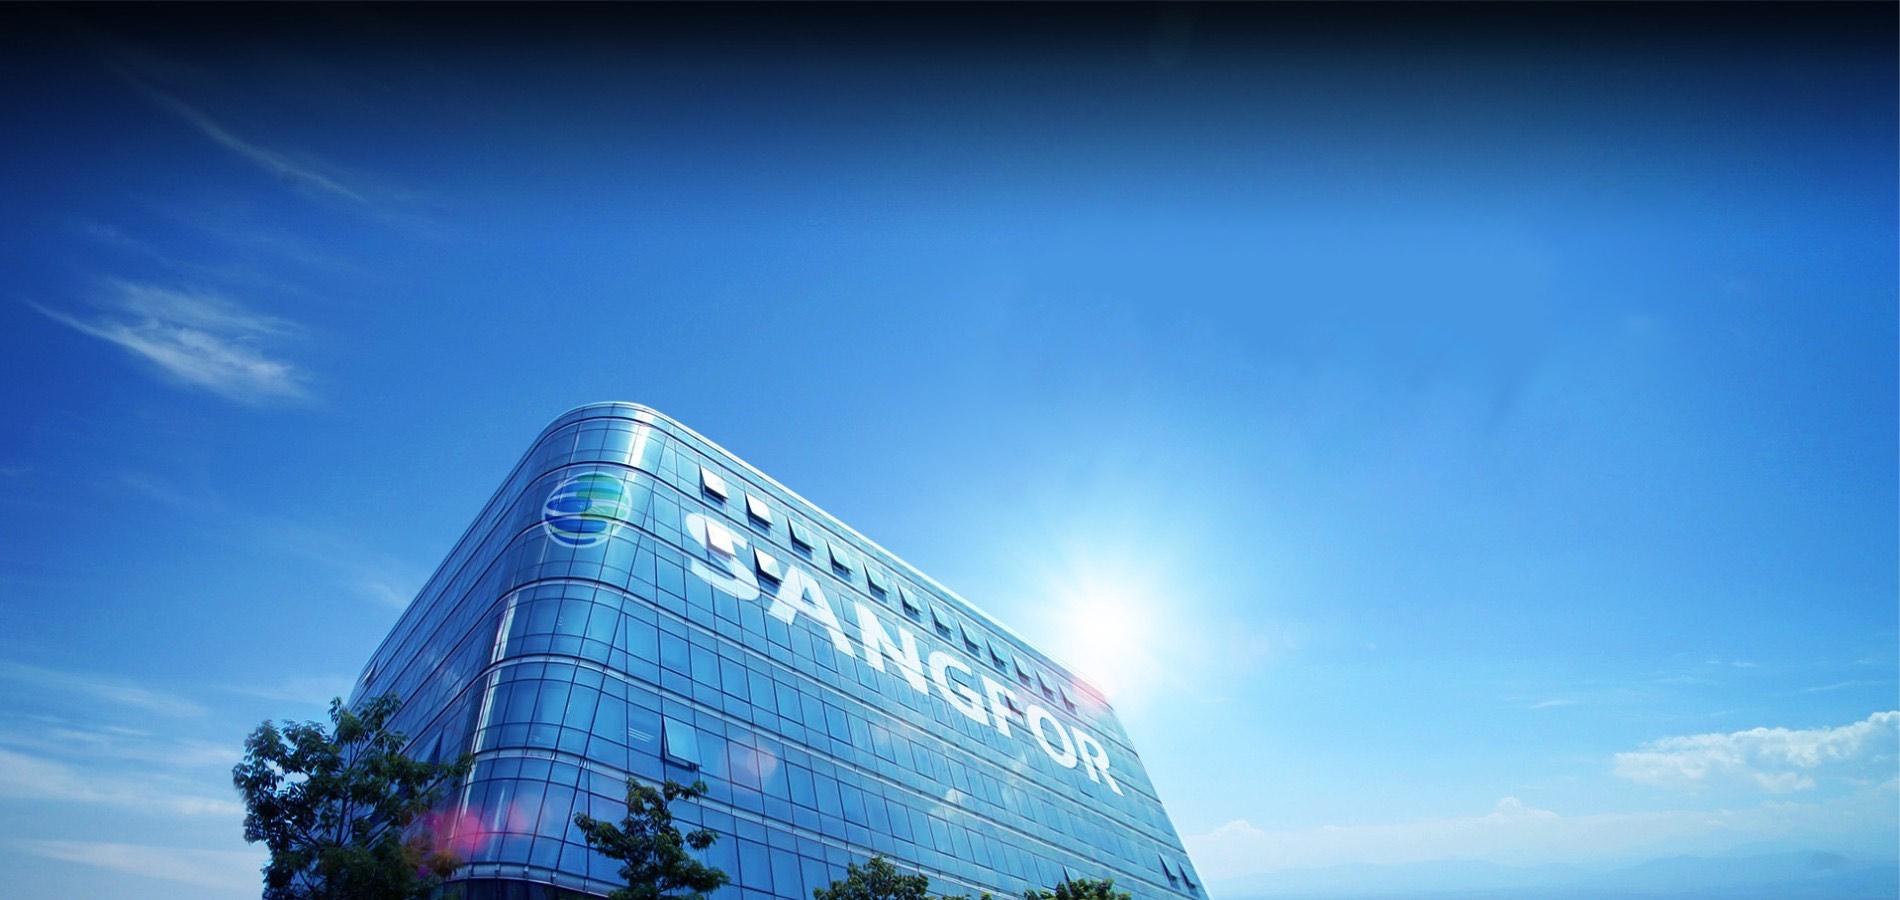 Cometa distribuisce Sangfor Technologies per sicurezza e cloud